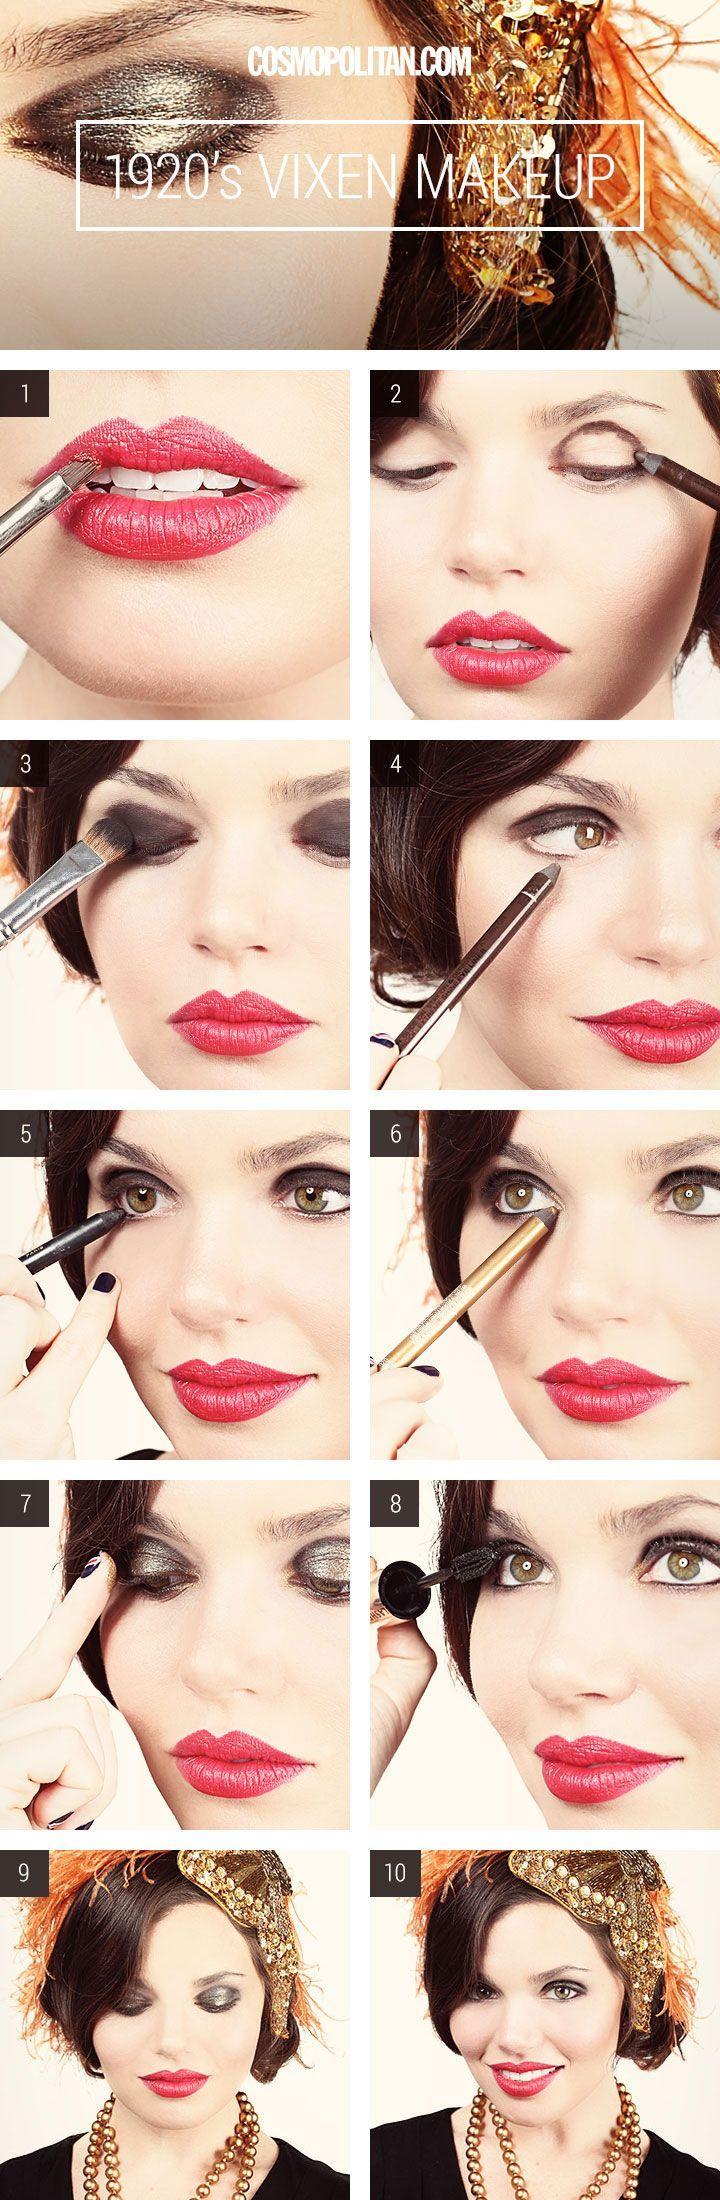 Flapper Girl Makeup!! My latest  Magazine tutorial is now LIVE - using  New York @Lisa Phillips-Barton Phillips-Barton'Oreal Knowles Blanchard  Cosmetics